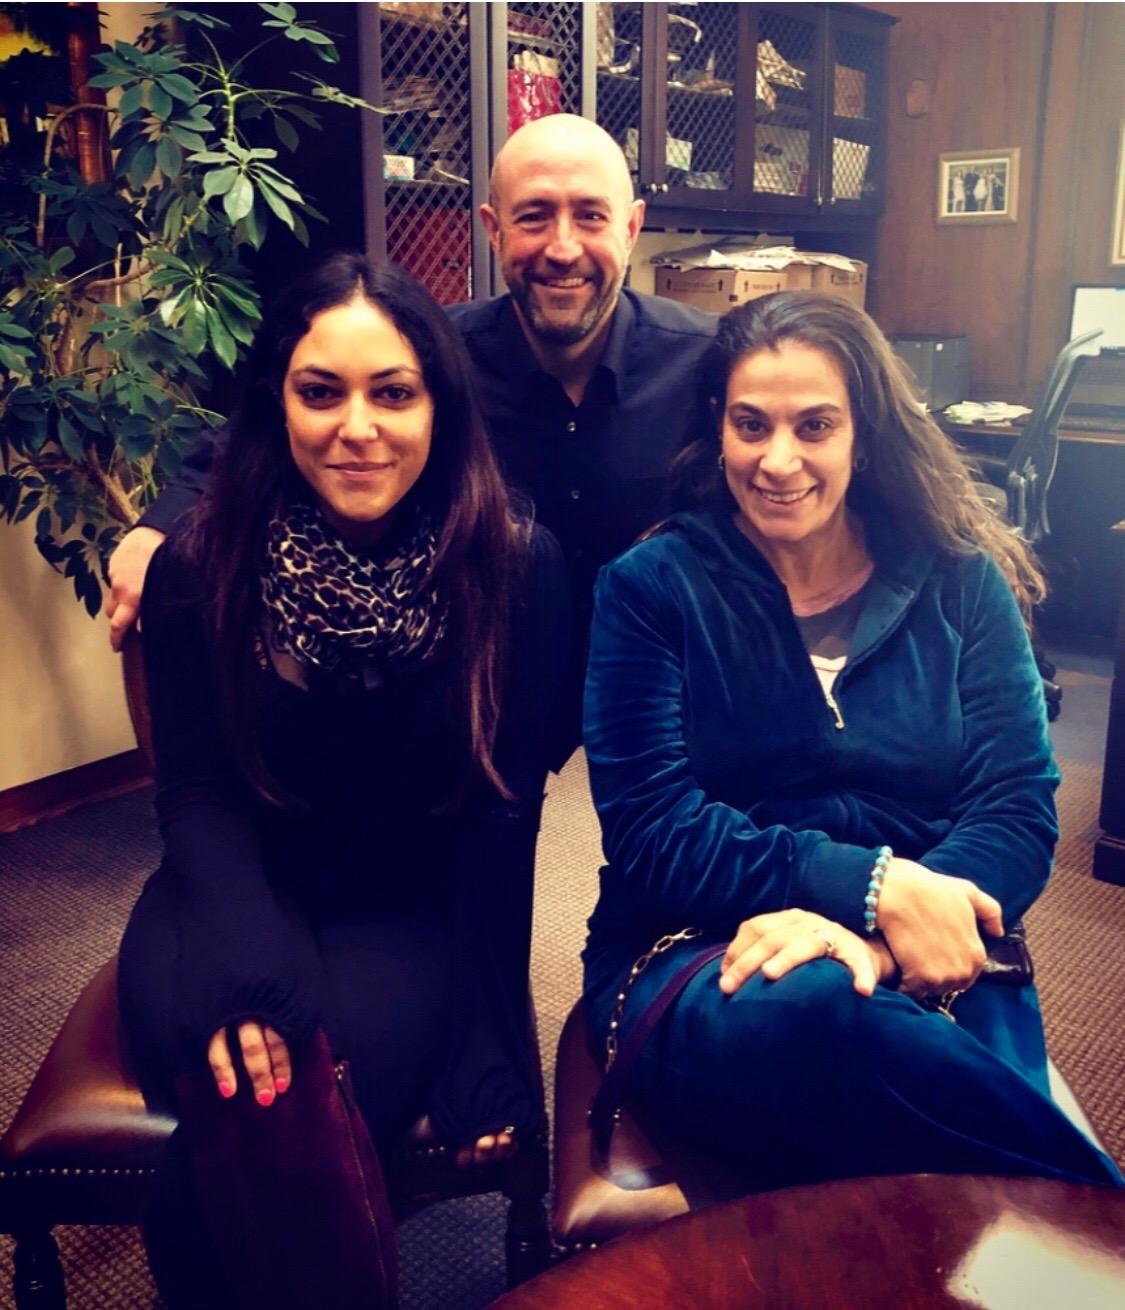 RCI Salma Hassouna, Jay Rosenzweig, & Maysoon Zayid at the offices of Rosenzweig & Company 20190320.jpeg